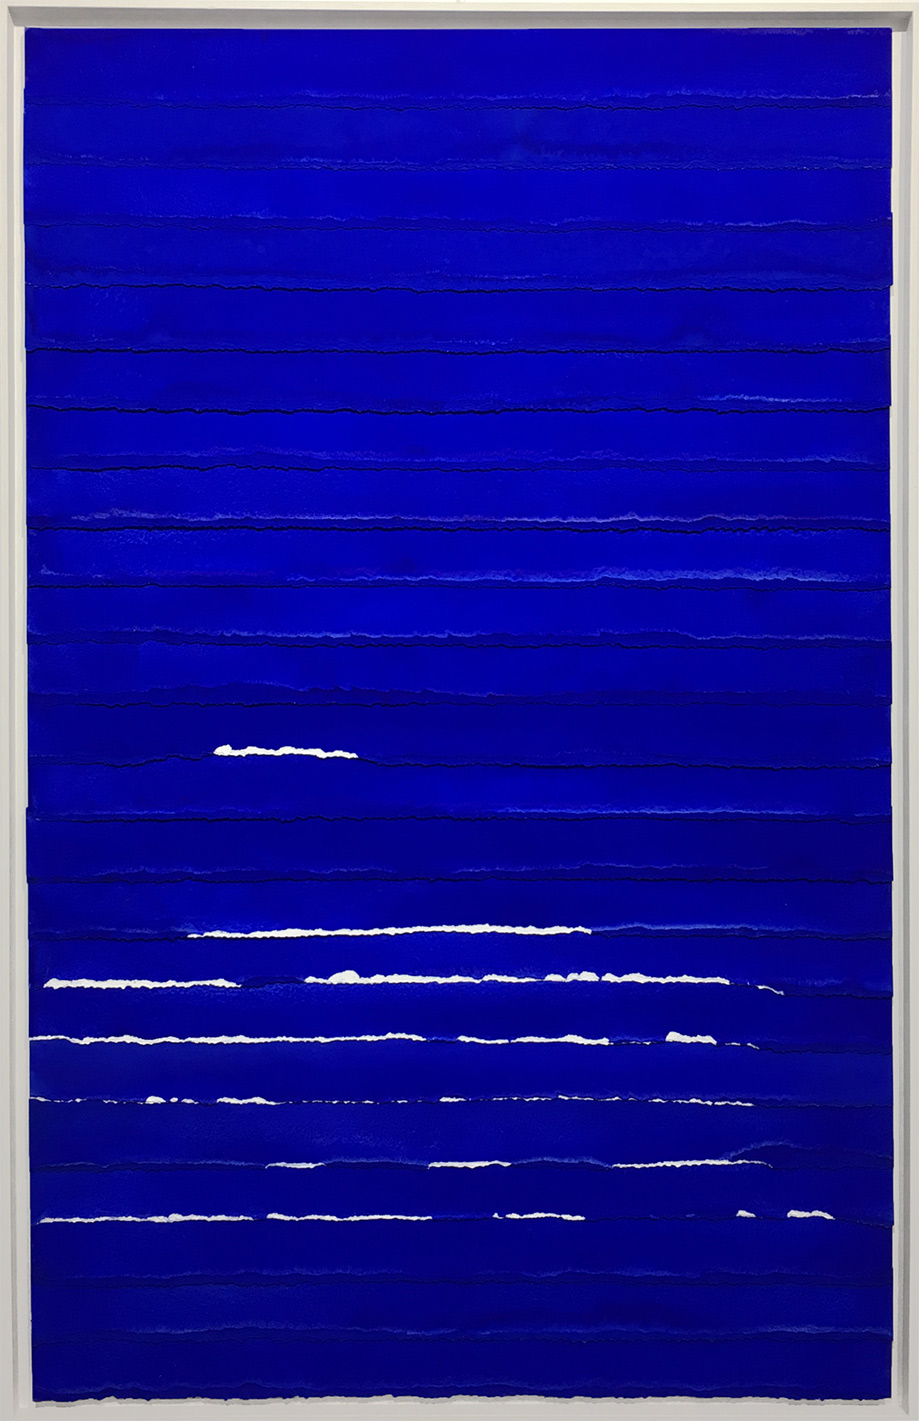 Bernard Gortais - Oeuvre sur papier - Continuum 136